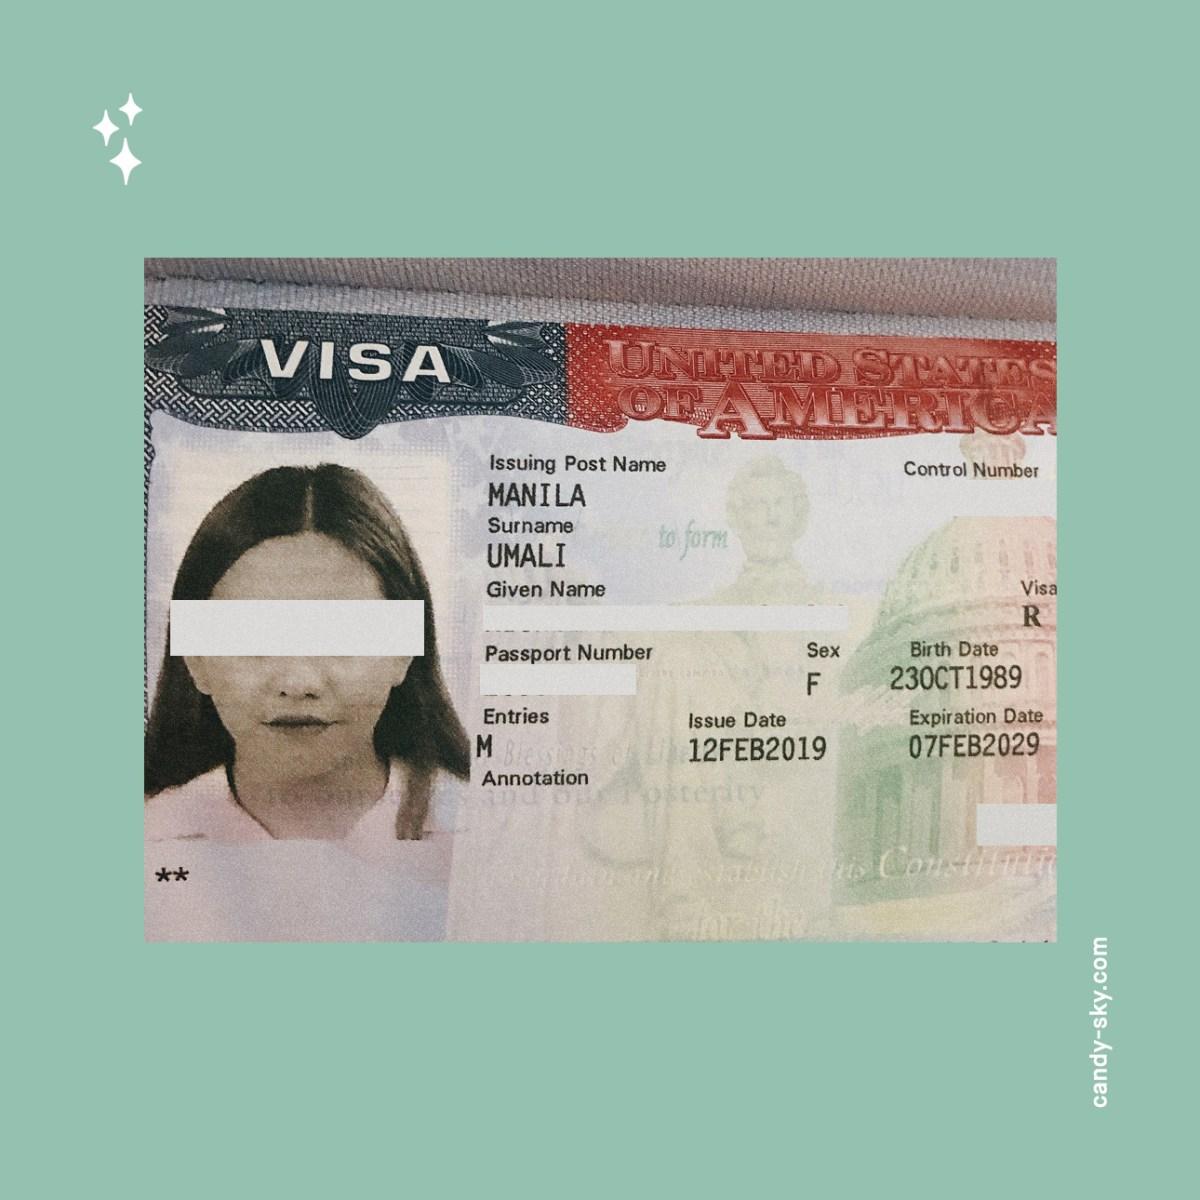 CandySky Of Memories: 2019 February - US Visa Renewed